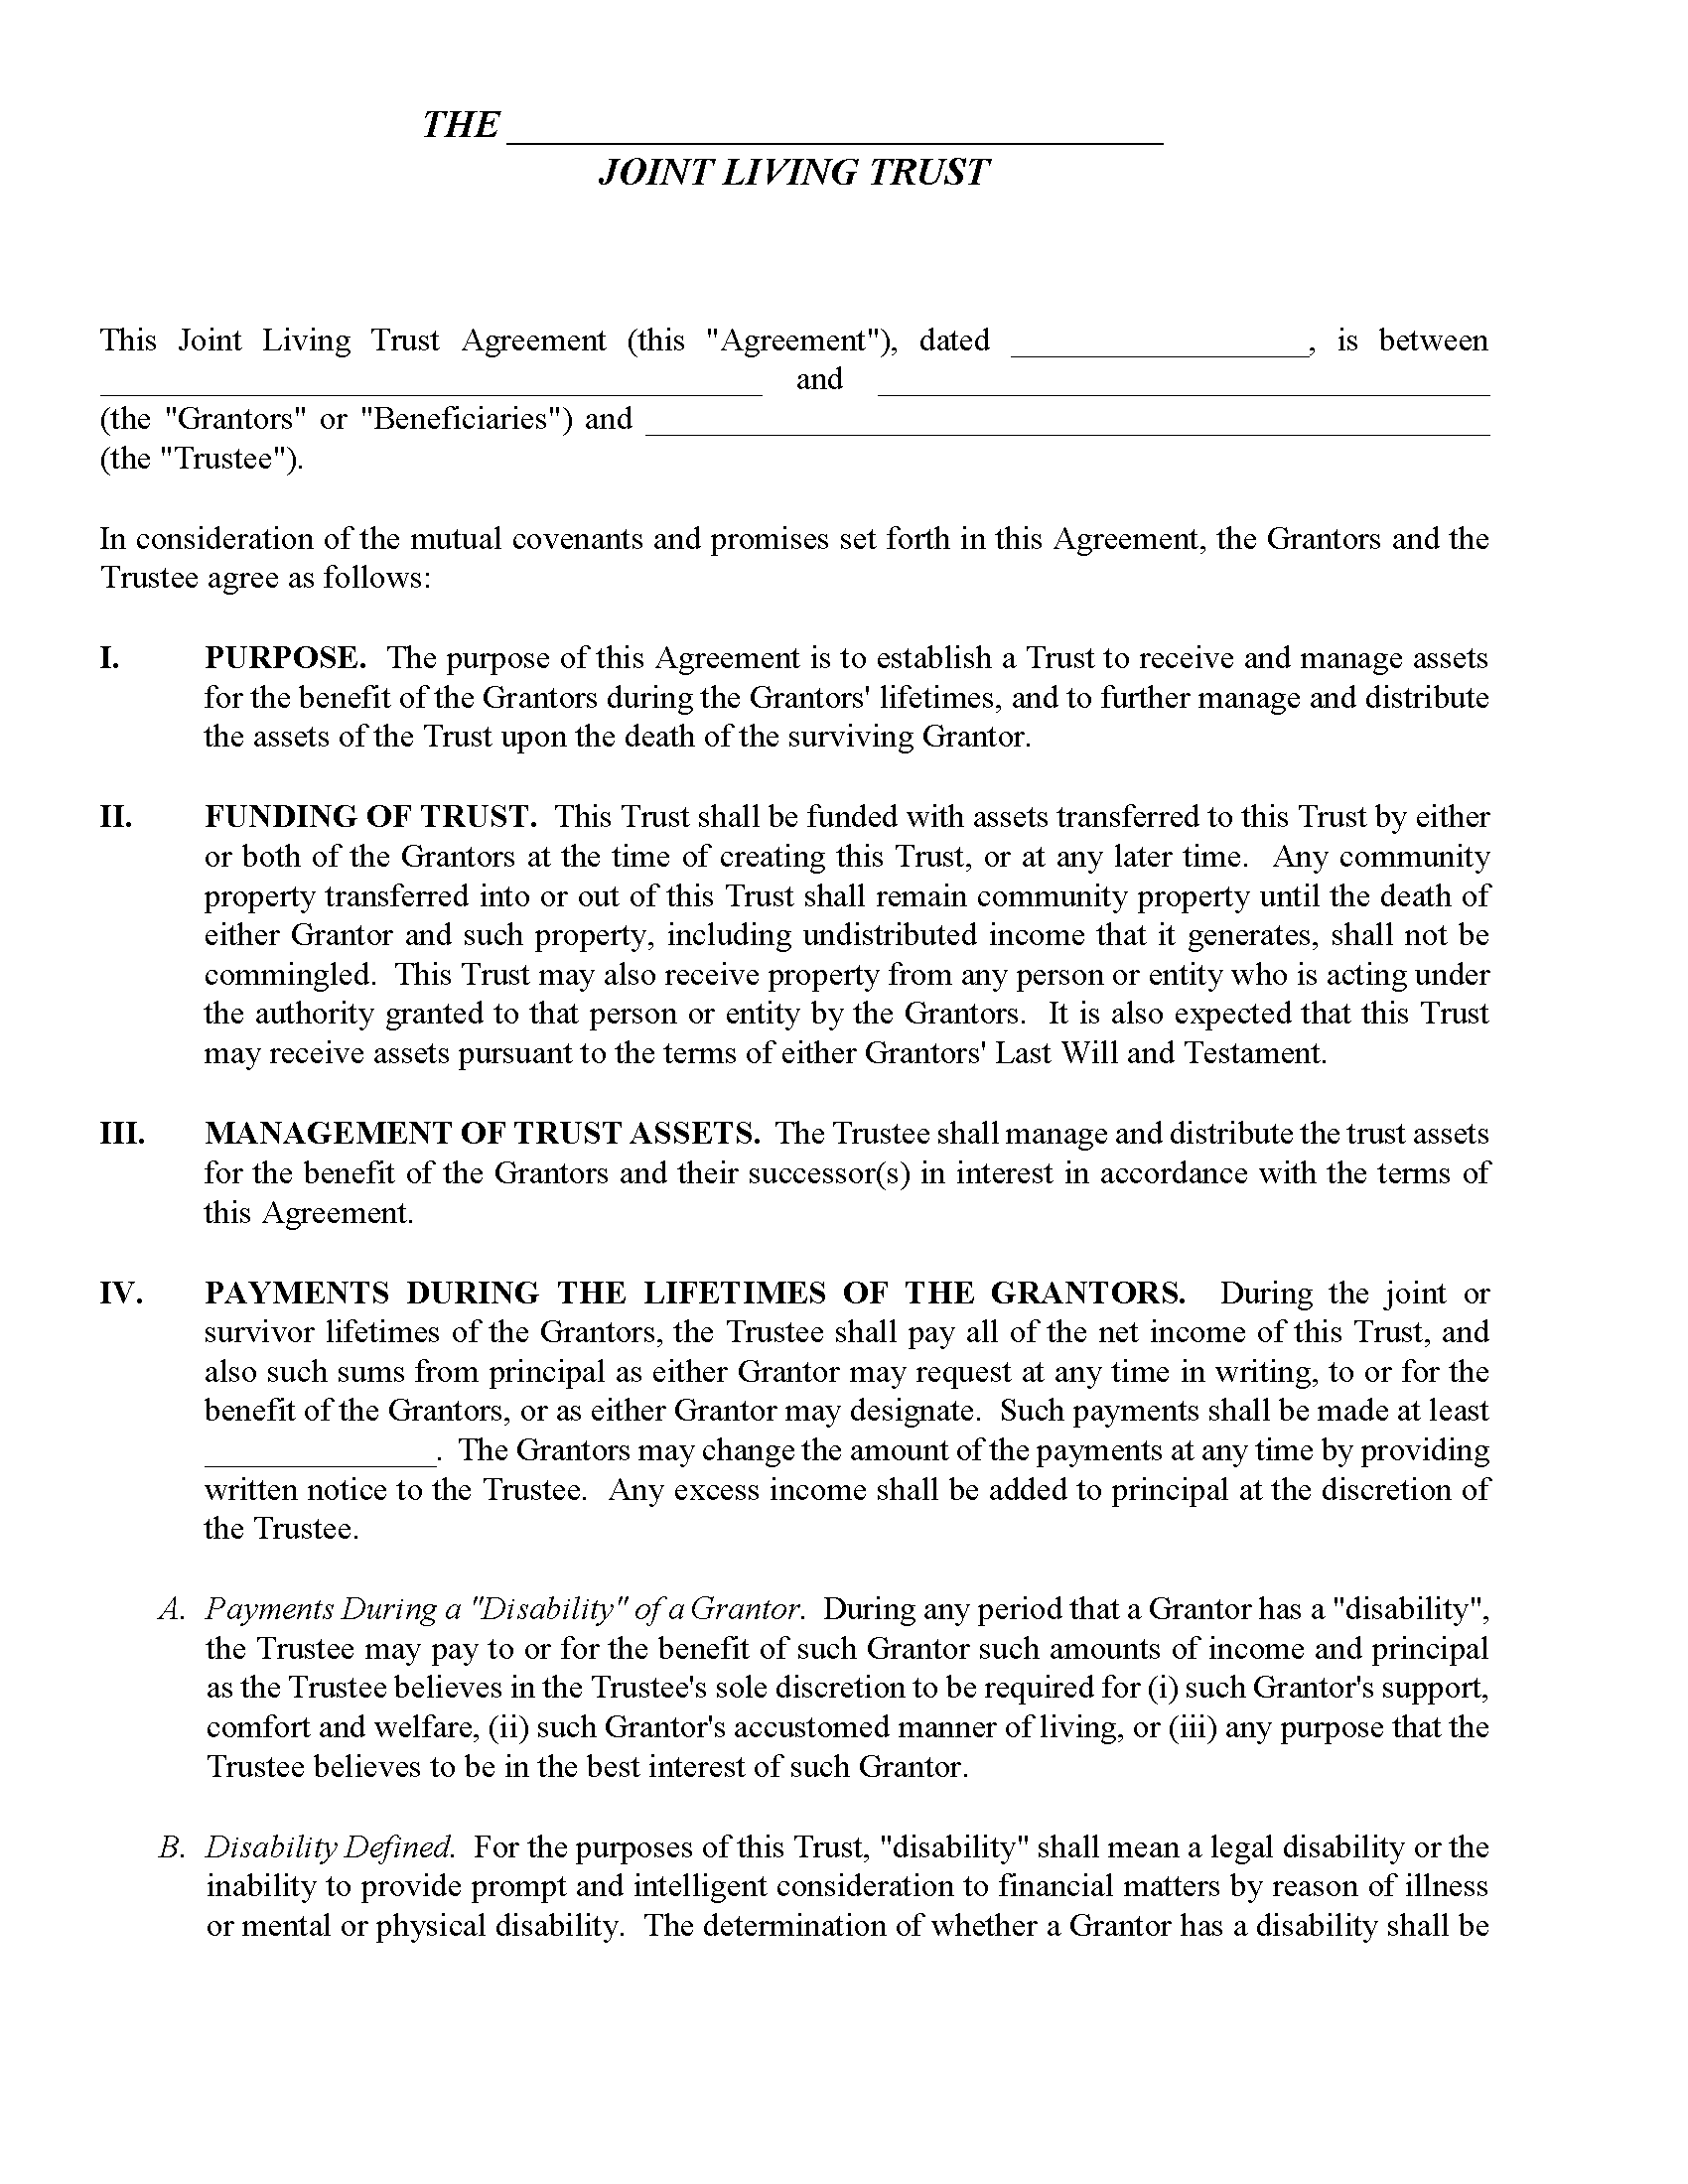 Illinois Joint Living Trust Form